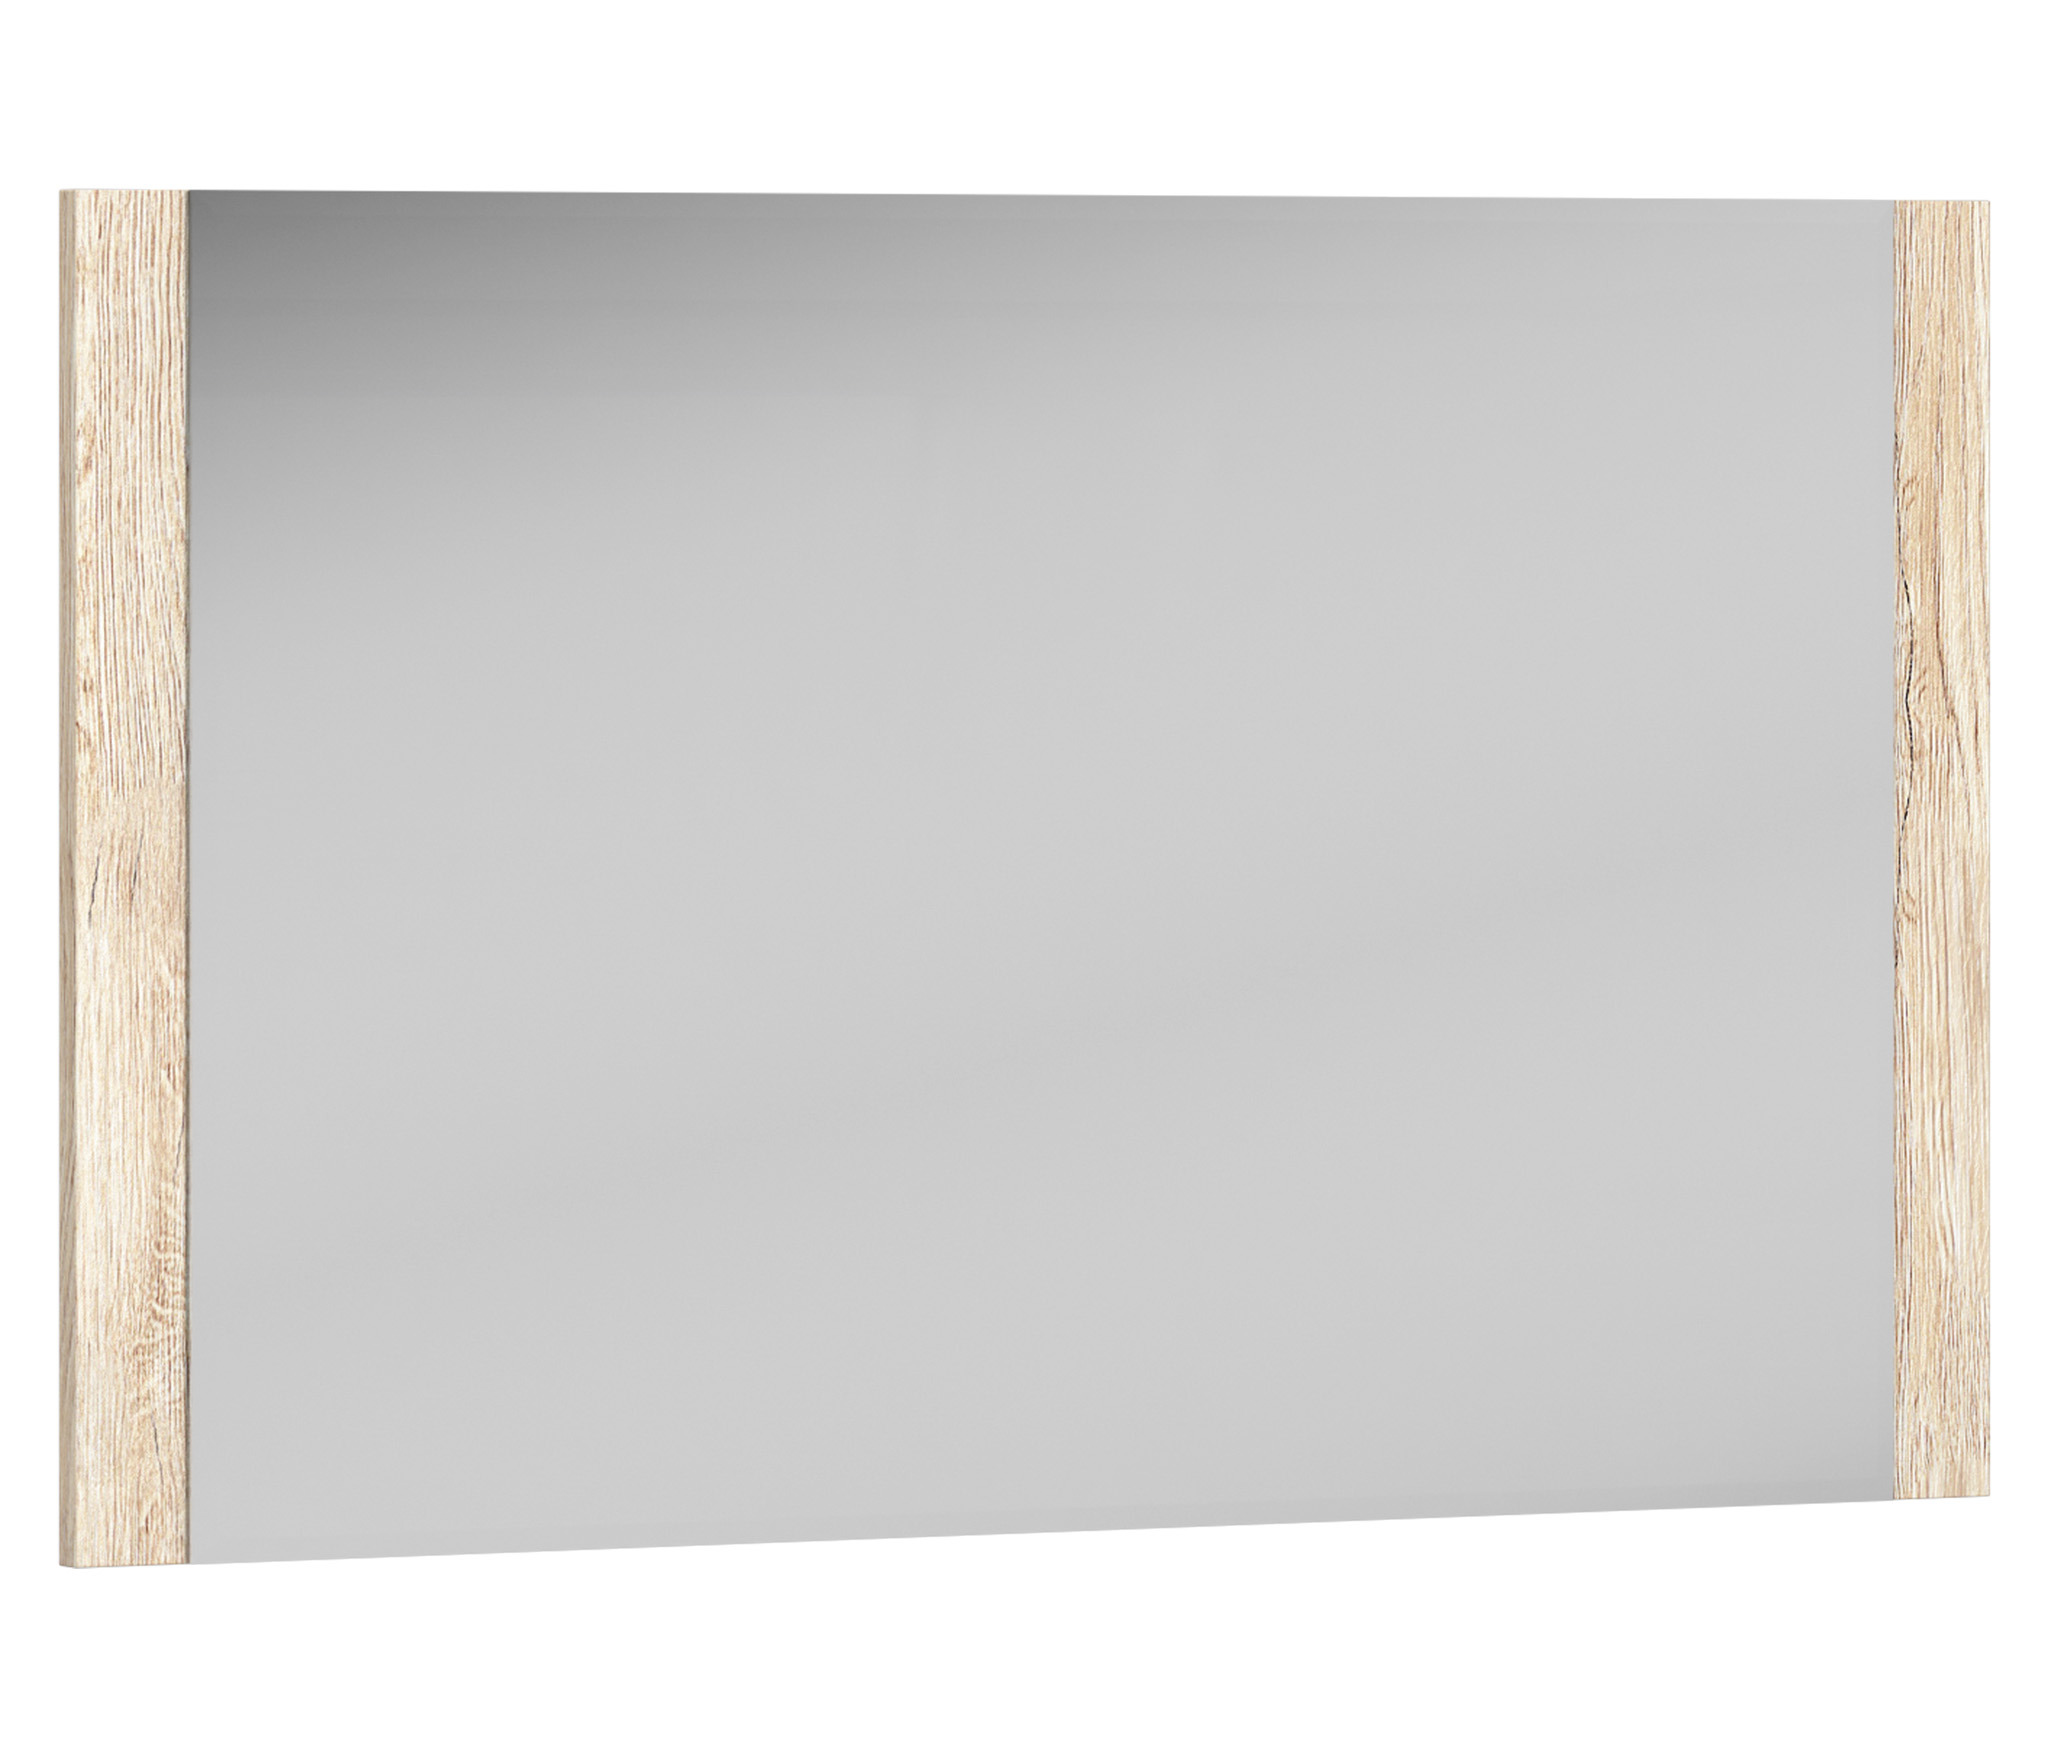 Милано СБ-2330 ЗеркалоЗеркала<br><br><br>Длина мм: 900<br>Высота мм: 550<br>Глубина мм: 19